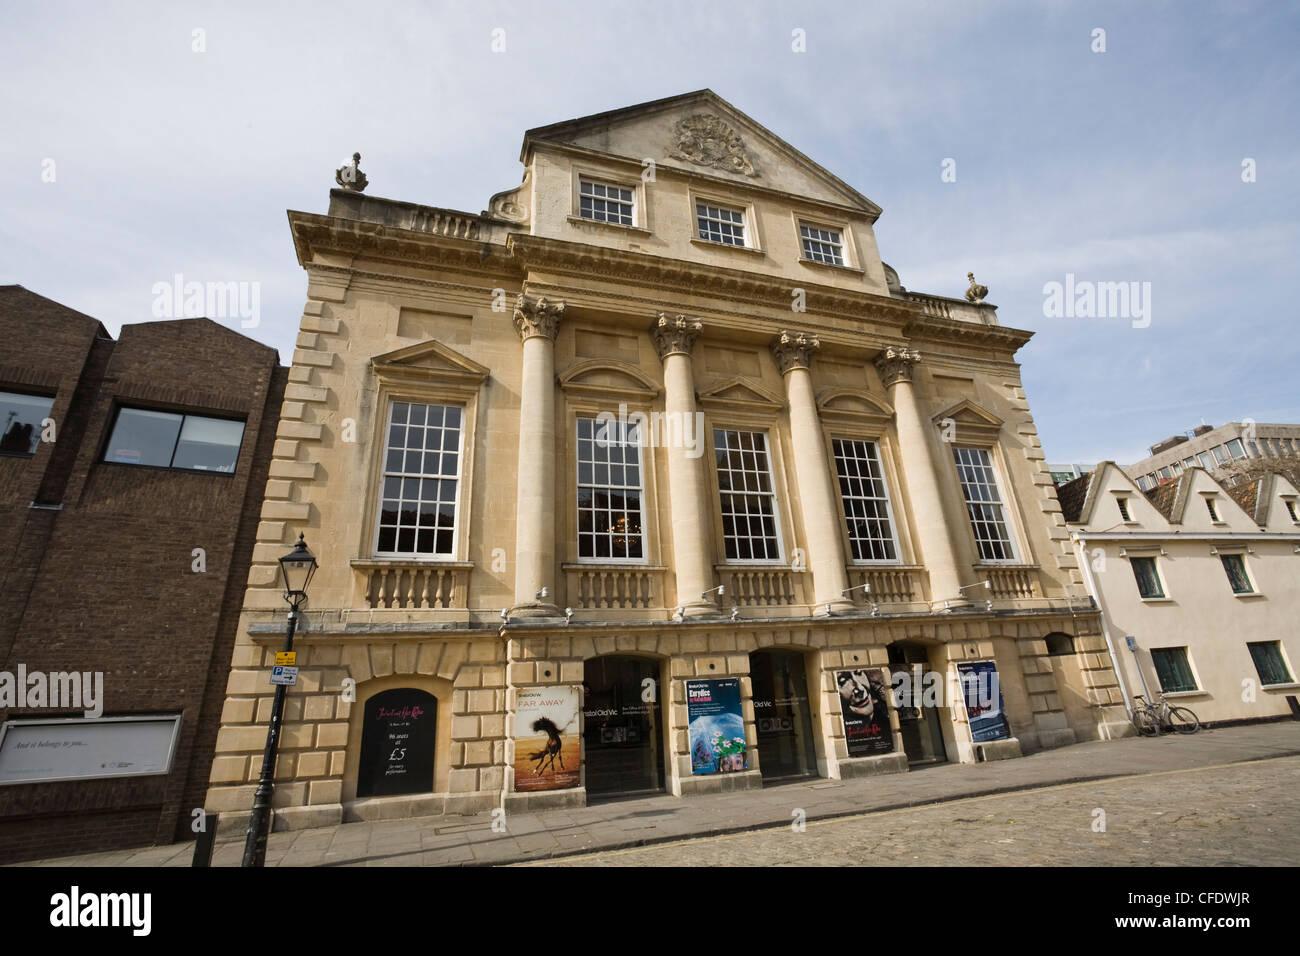 Old Vic Theatre, Bristol, Avon, England, United Kingdom, Europe - Stock Image